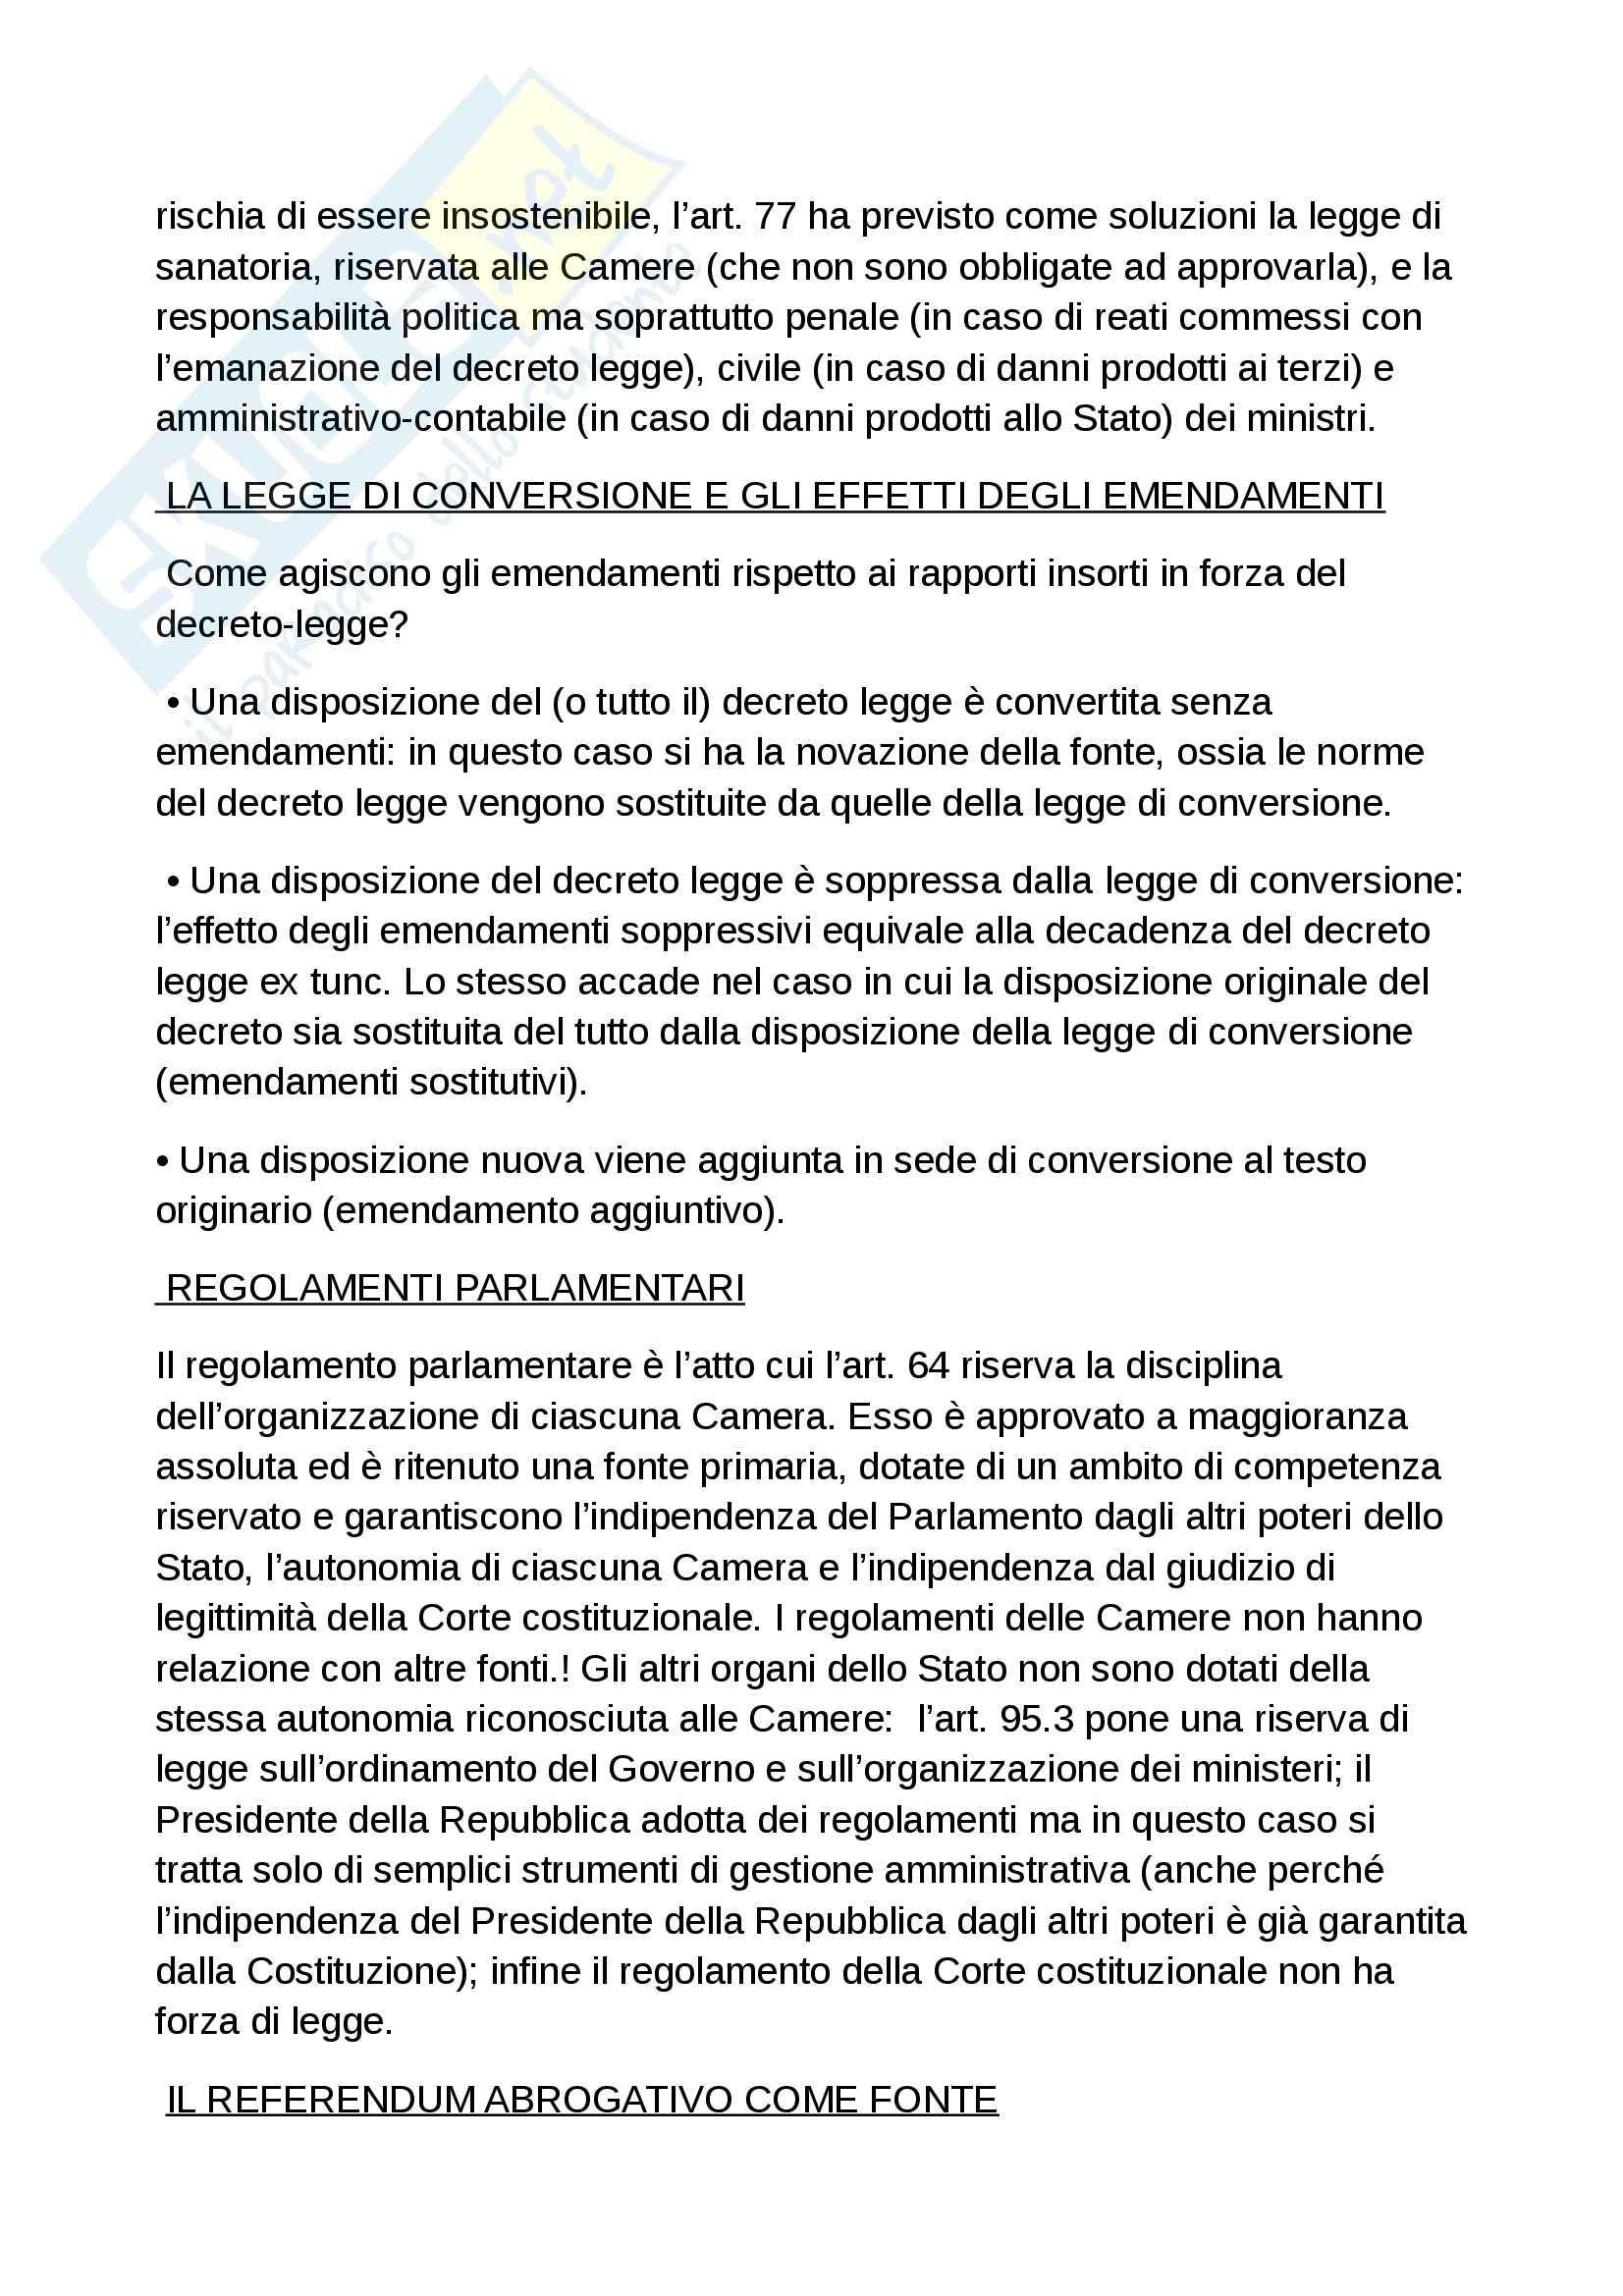 Riassunto esame diritto costituzionale, prof. Grosso, libro Diritto costituzionale, Bin, Pitruzzella Pag. 66